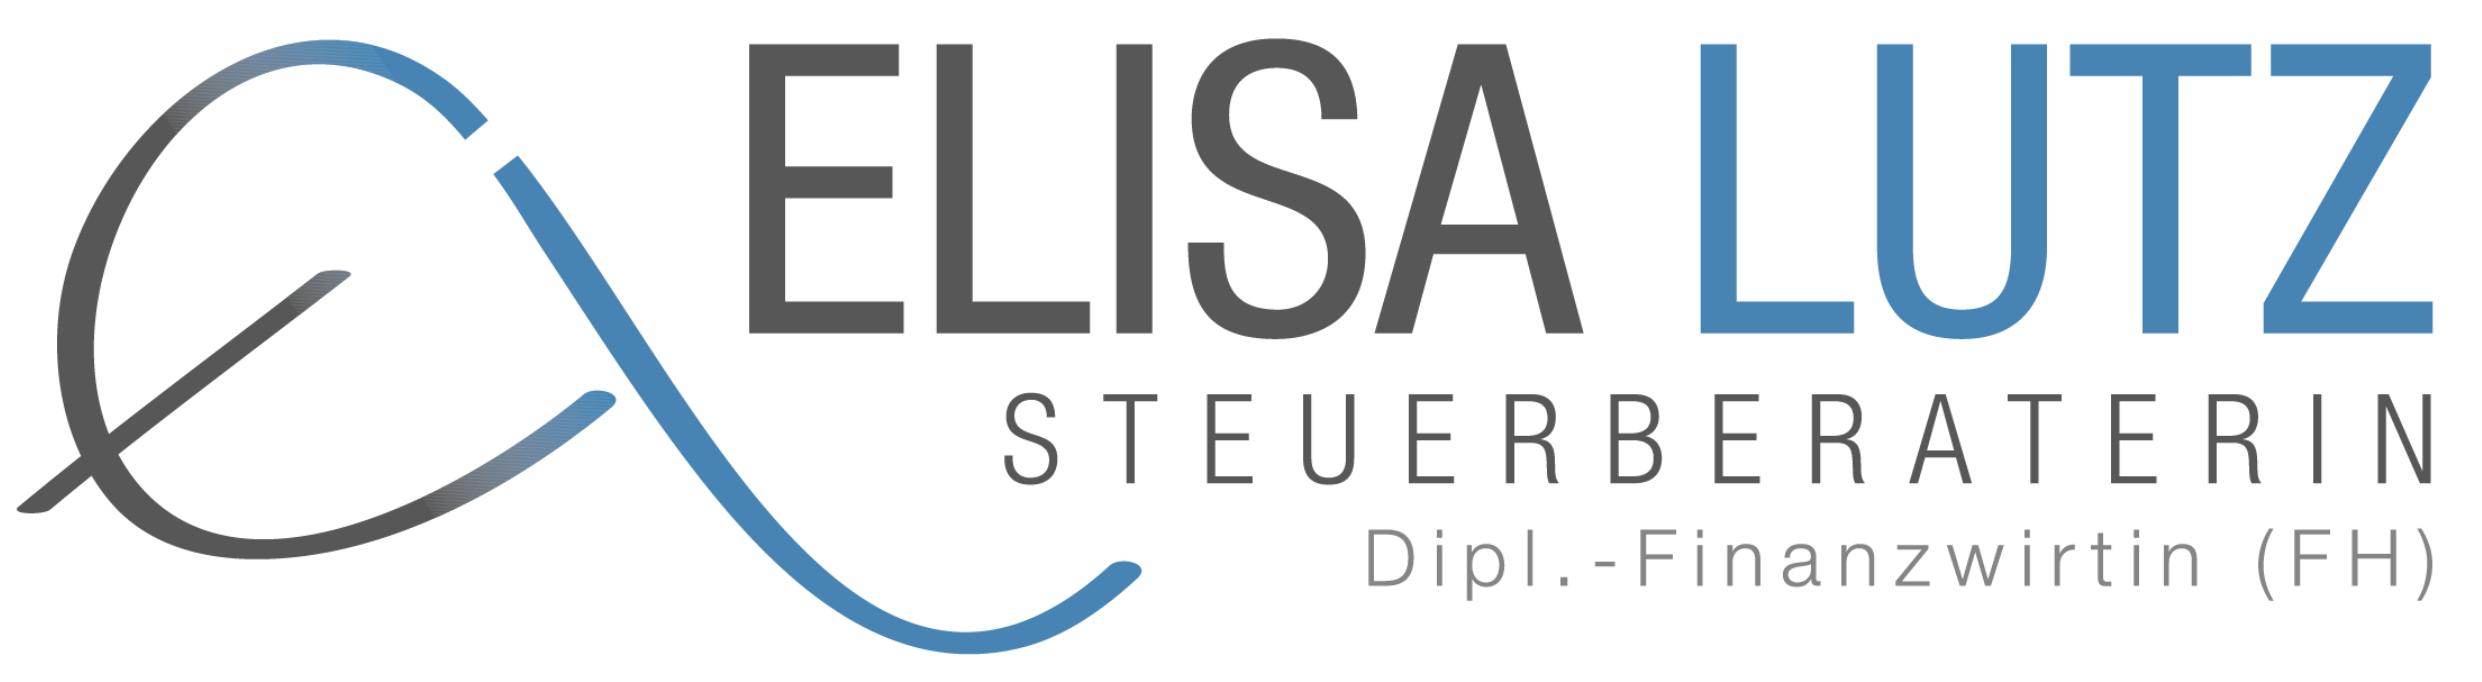 Steuerberatungskanzlei Elisa Lutz